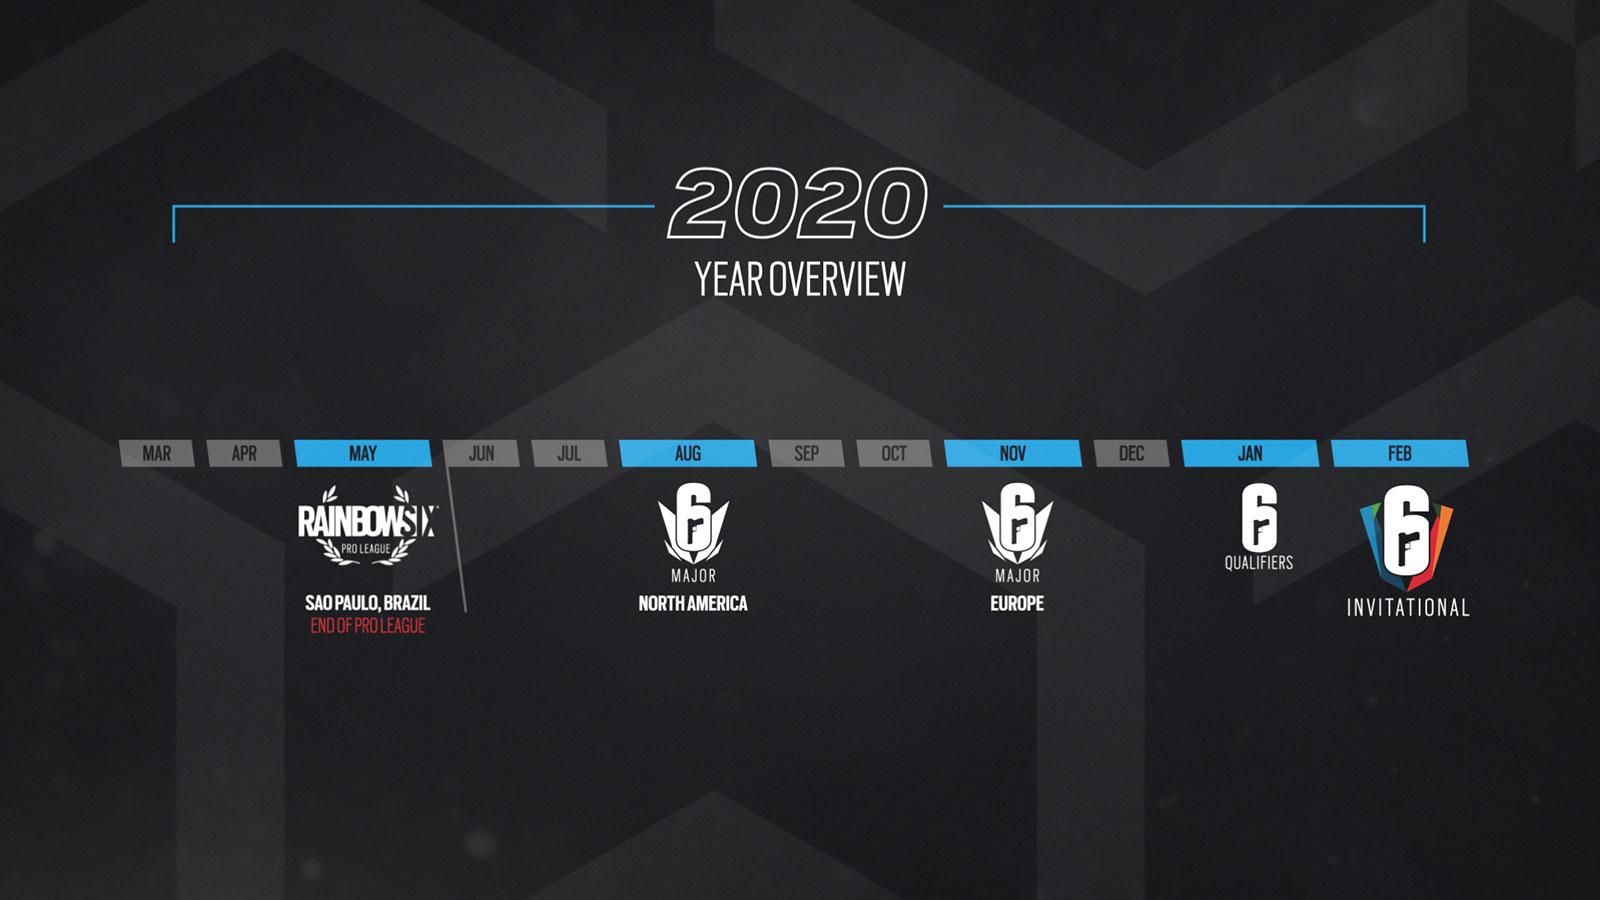 Programme année 2020 R6 Siege Ubisoft